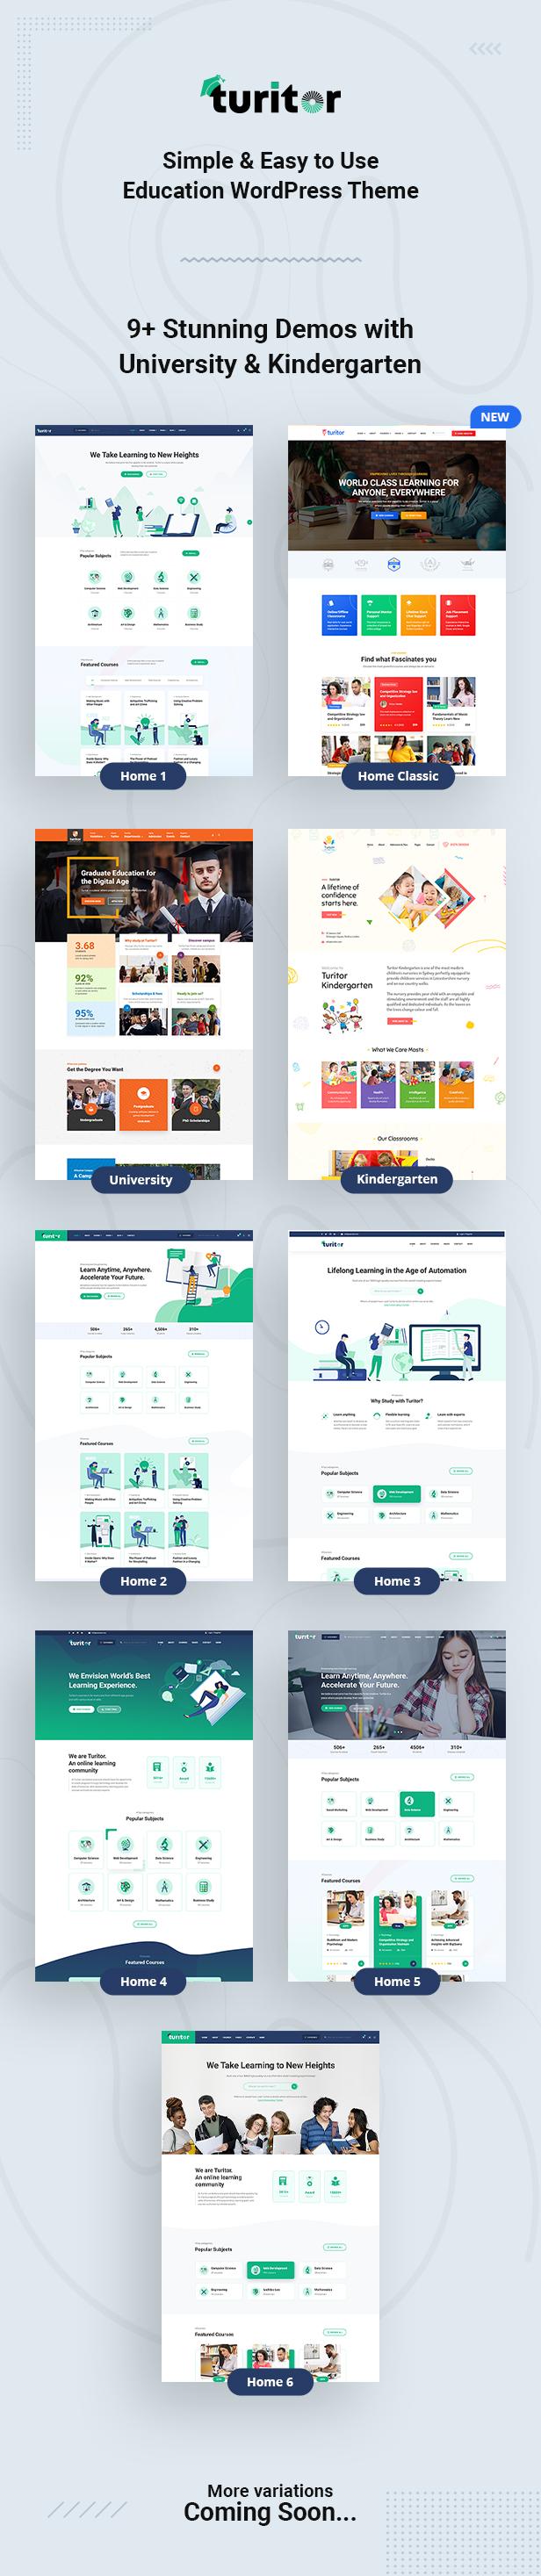 Turitor Education WordPress Theme